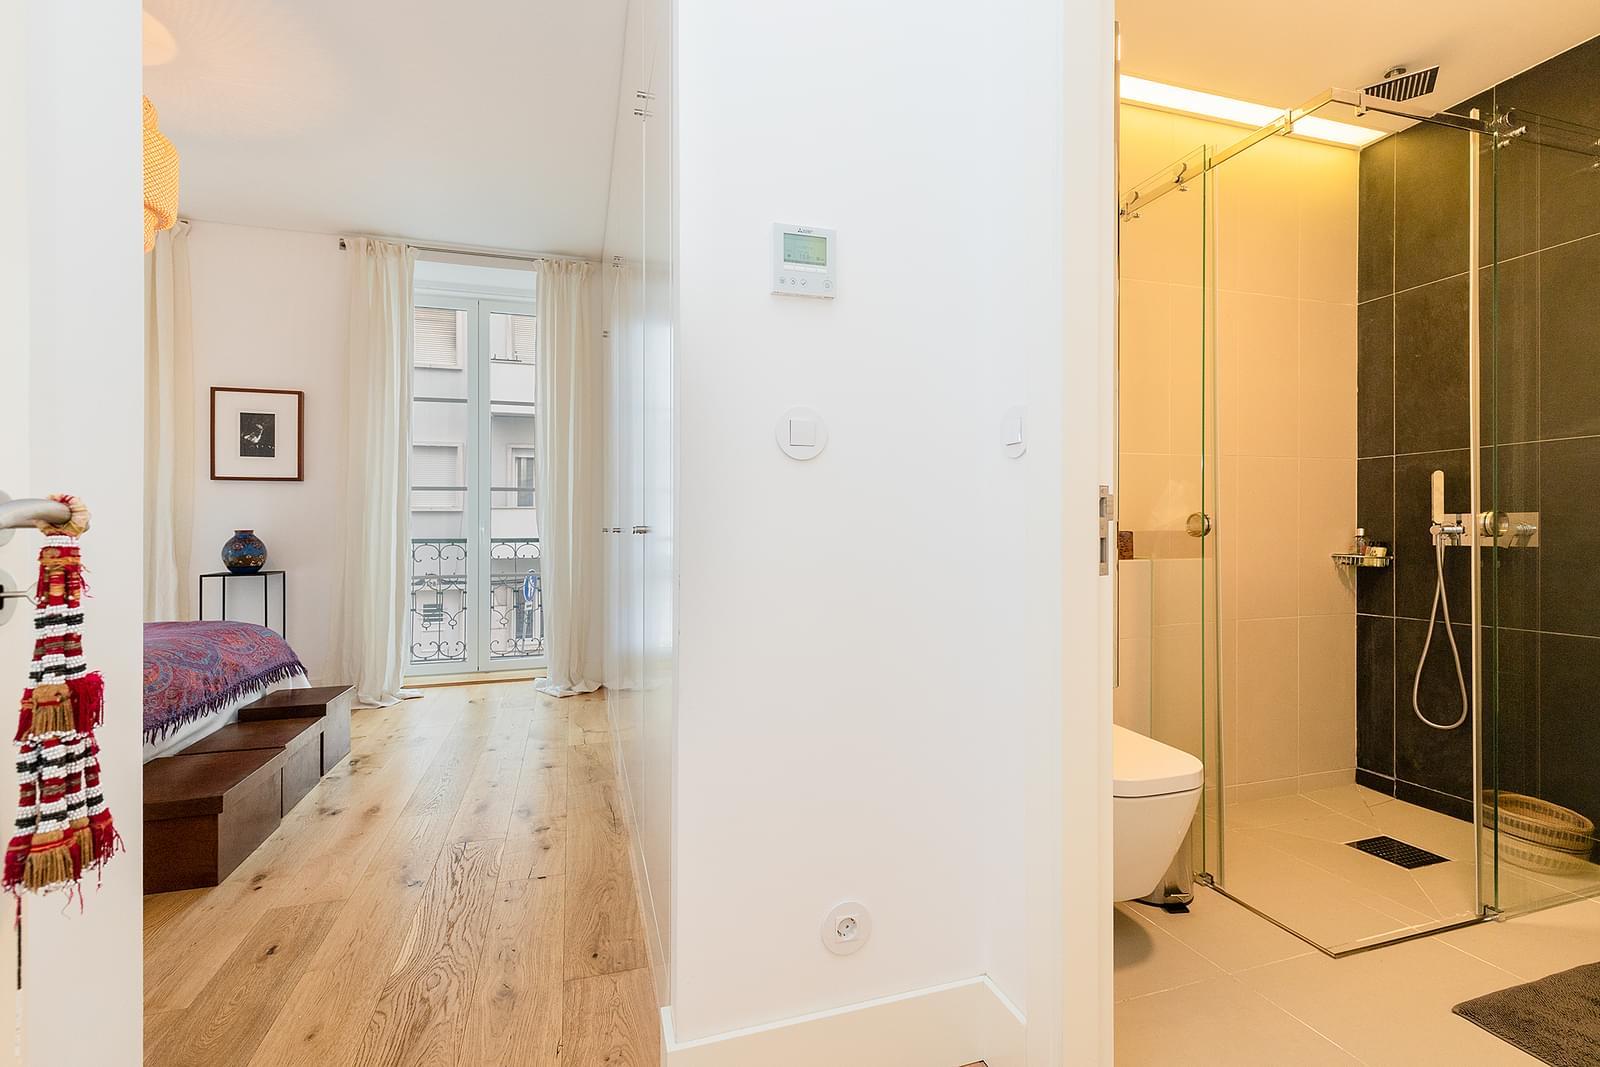 pf18824-apartamento-t2-1-lisboa-a304e7a2-aa2a-45f4-9228-81356a2e8205